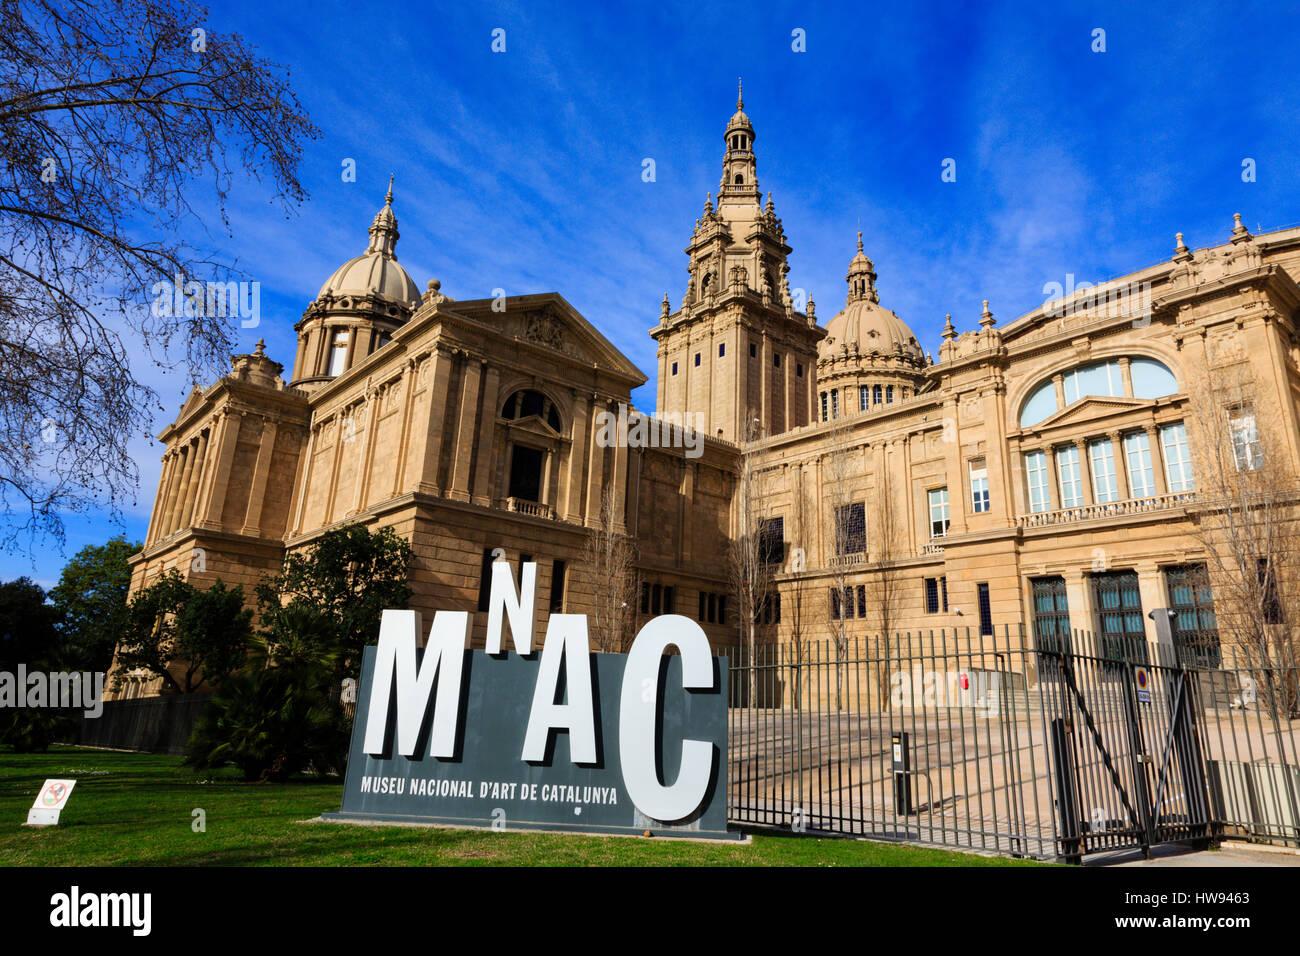 The MNAC, Museu Nacional d'Art de Catalunya, in Barcelona, Catalunya, Spain - Stock Image